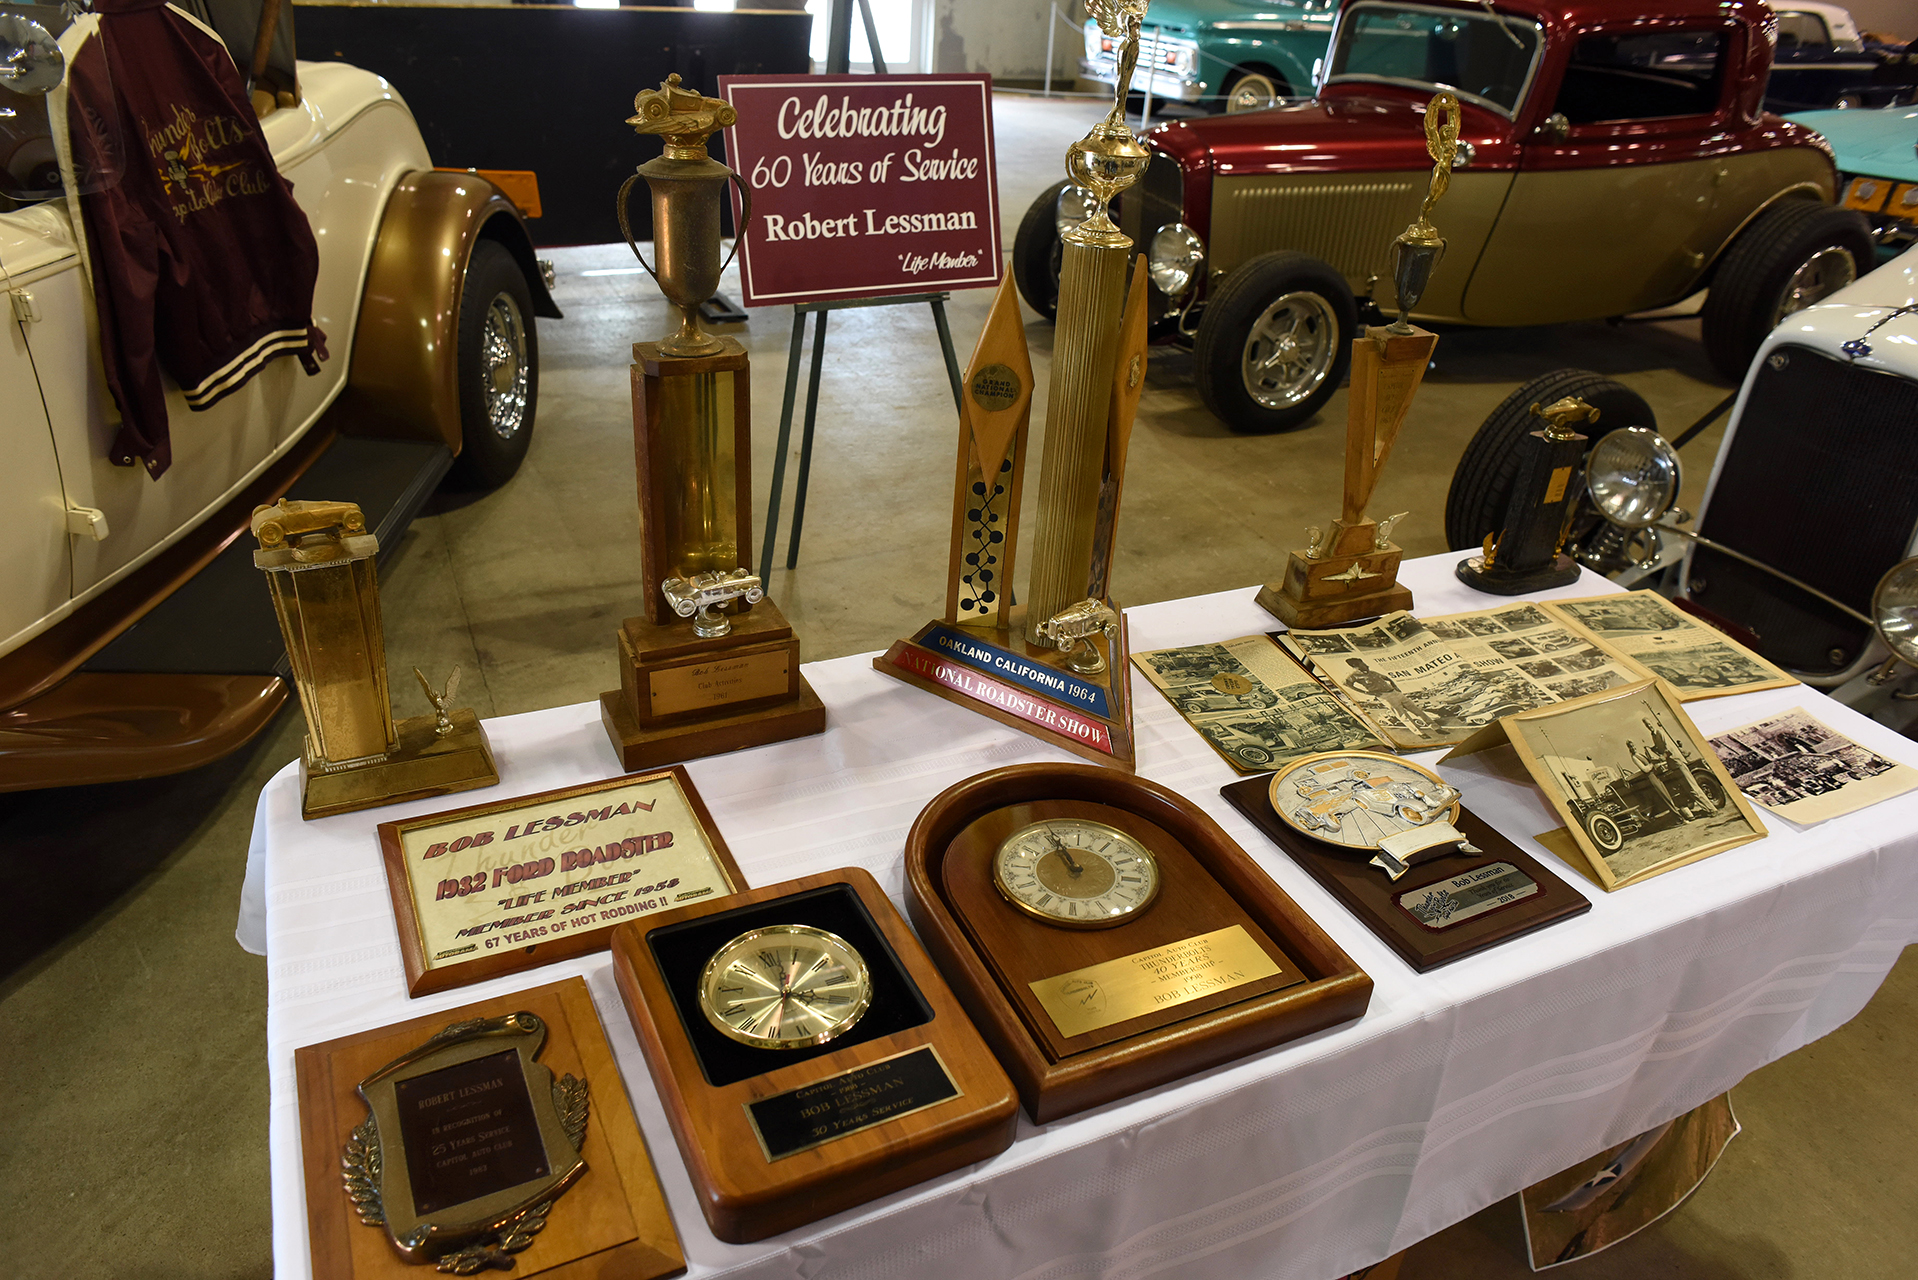 The Thunderbolts car club had a great display honoring Robert Lessman.